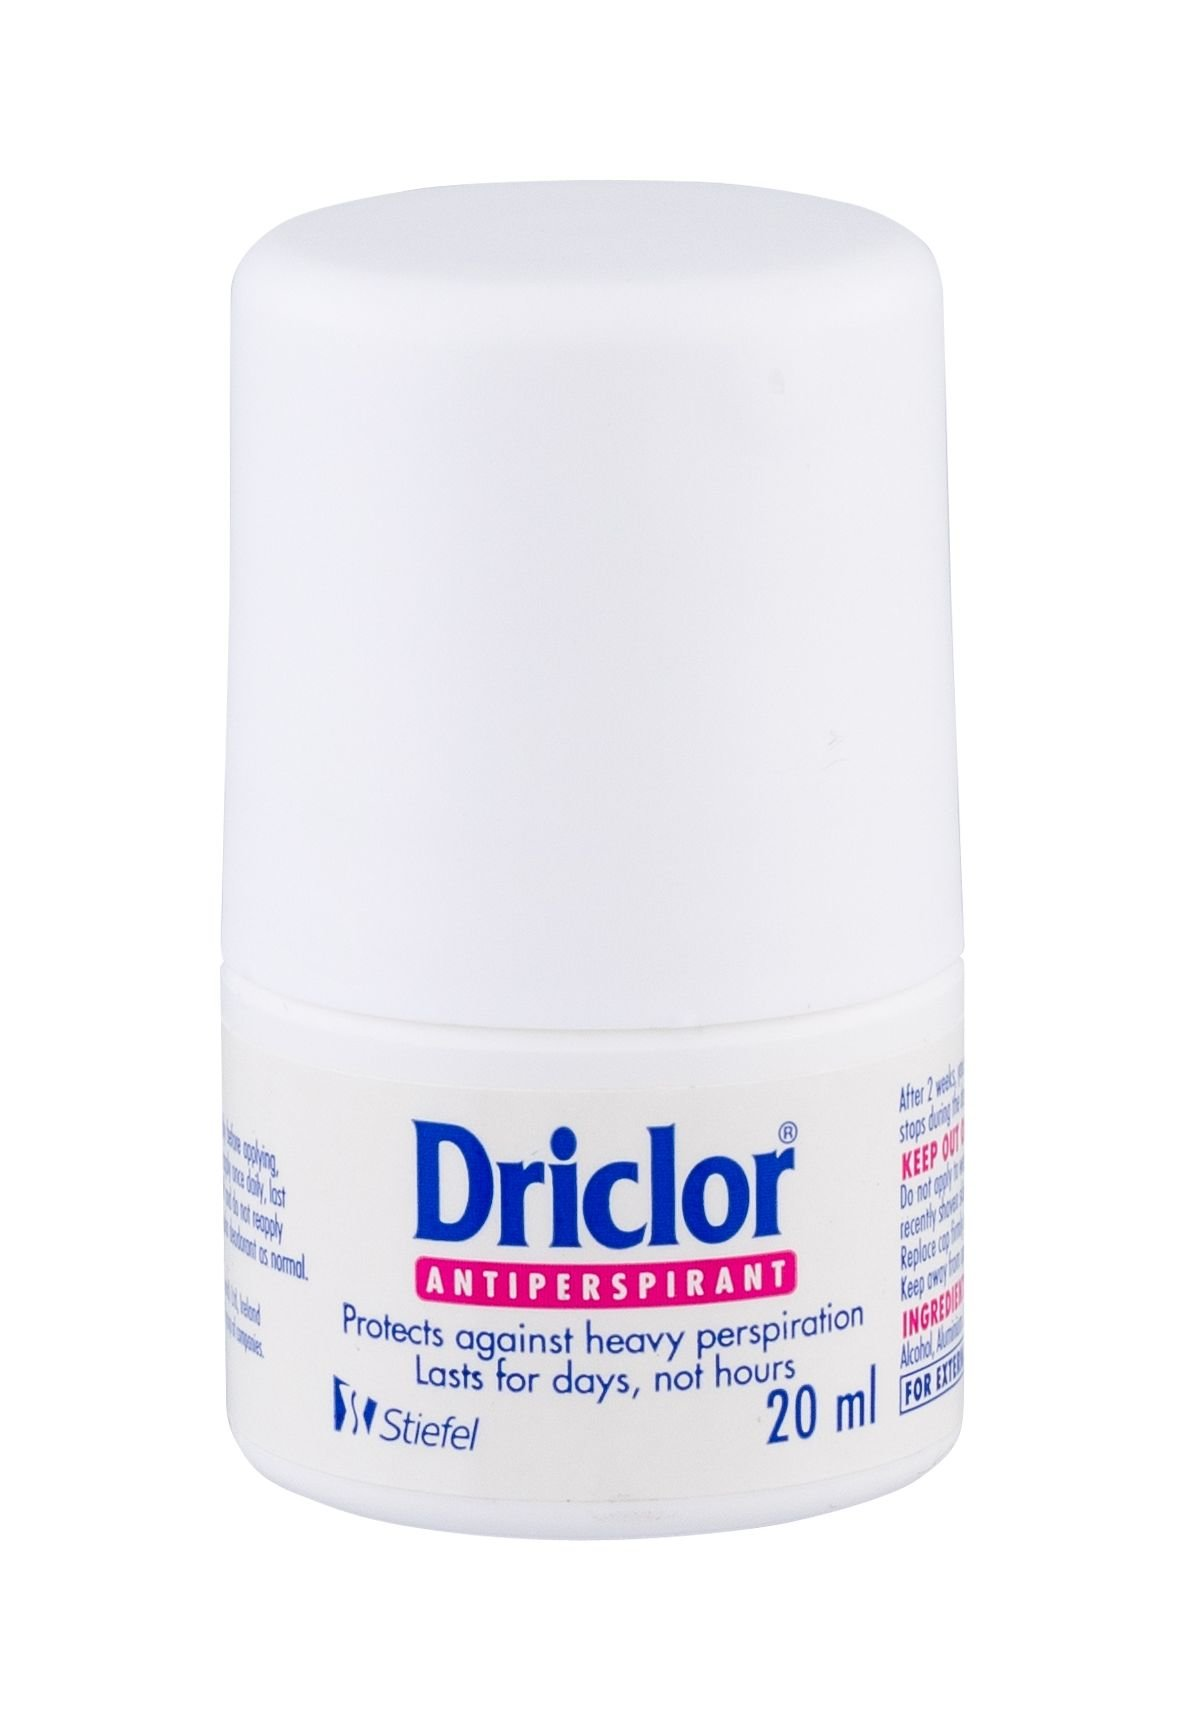 Driclor Antiperspirant Cosmetic 20ml